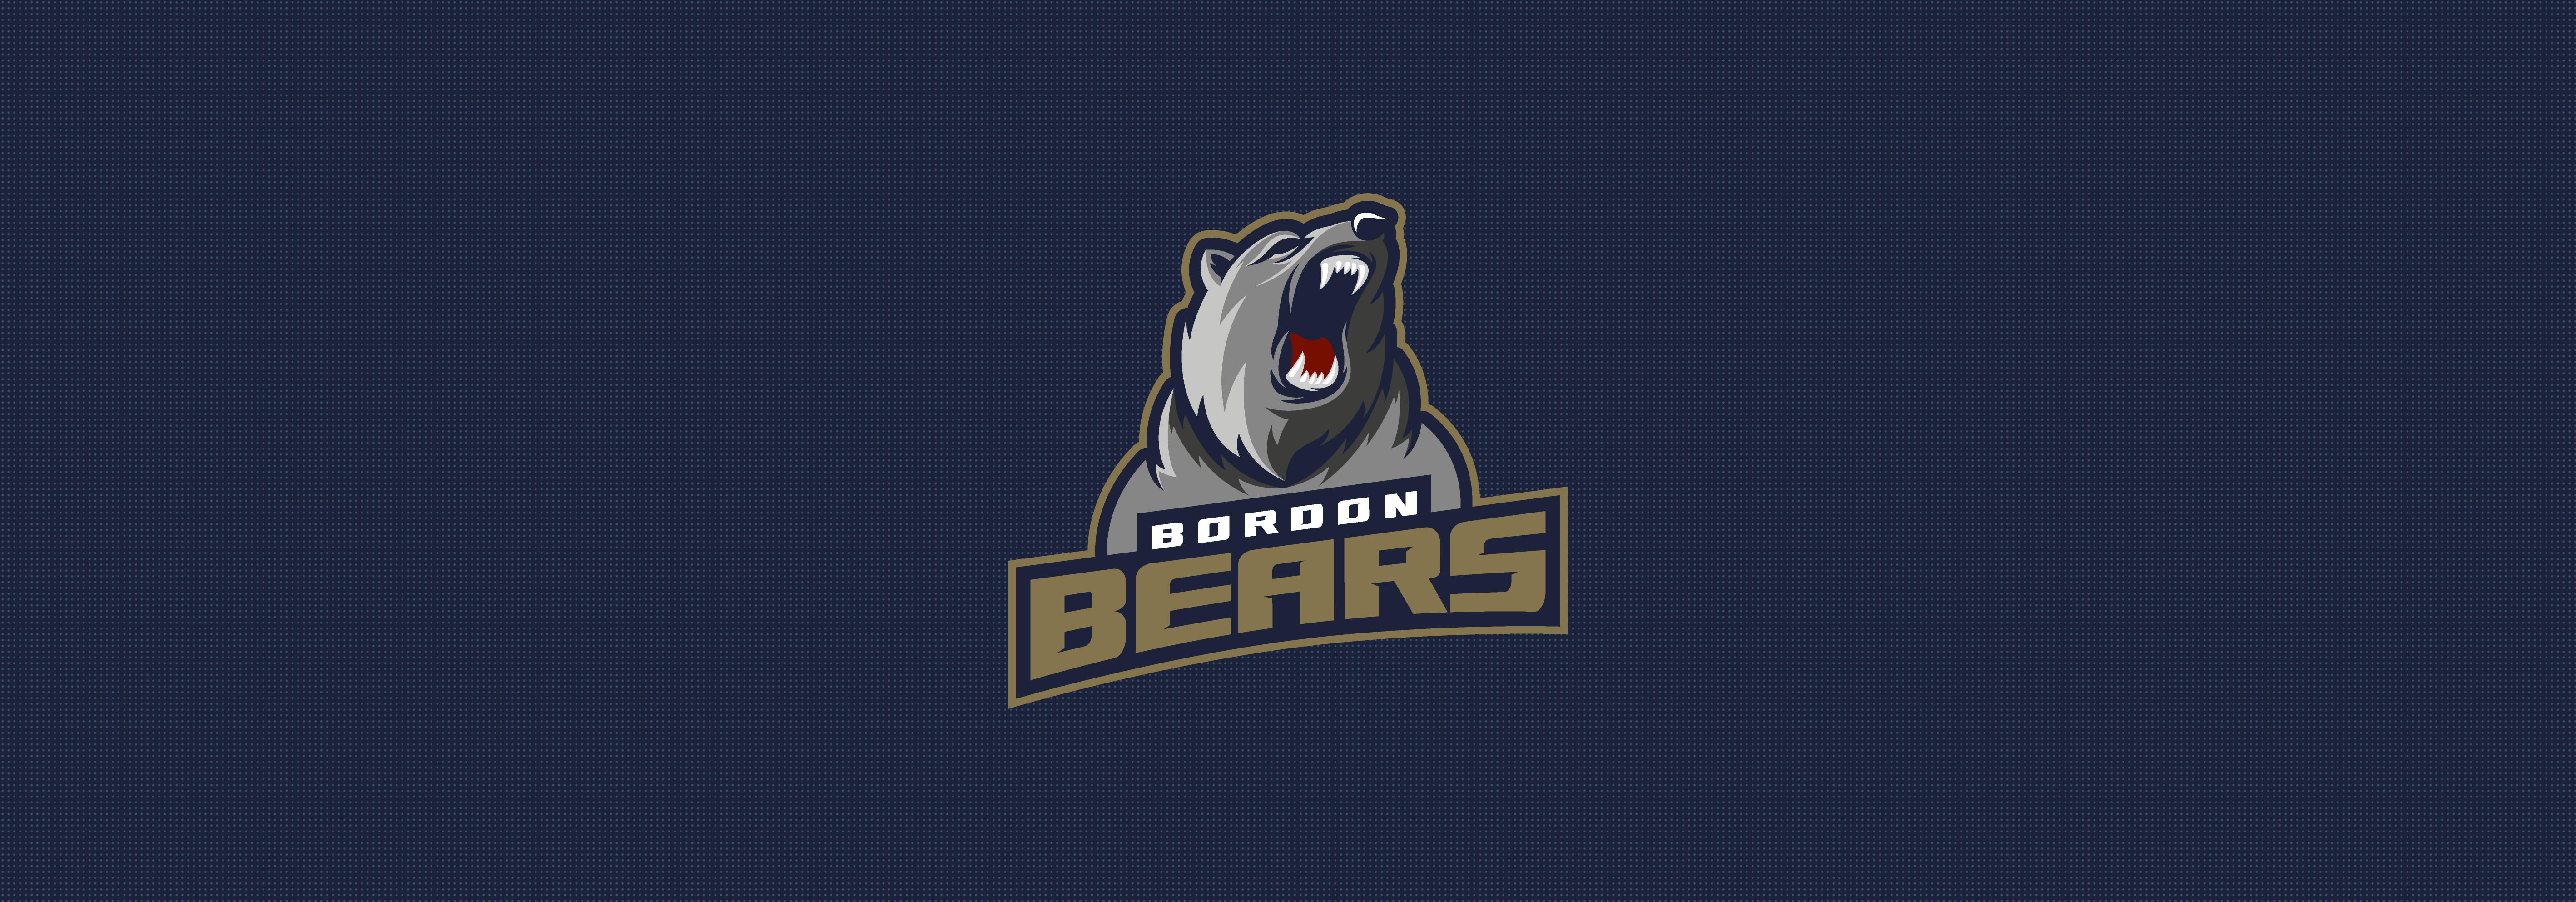 Bordon Bears Hoodie